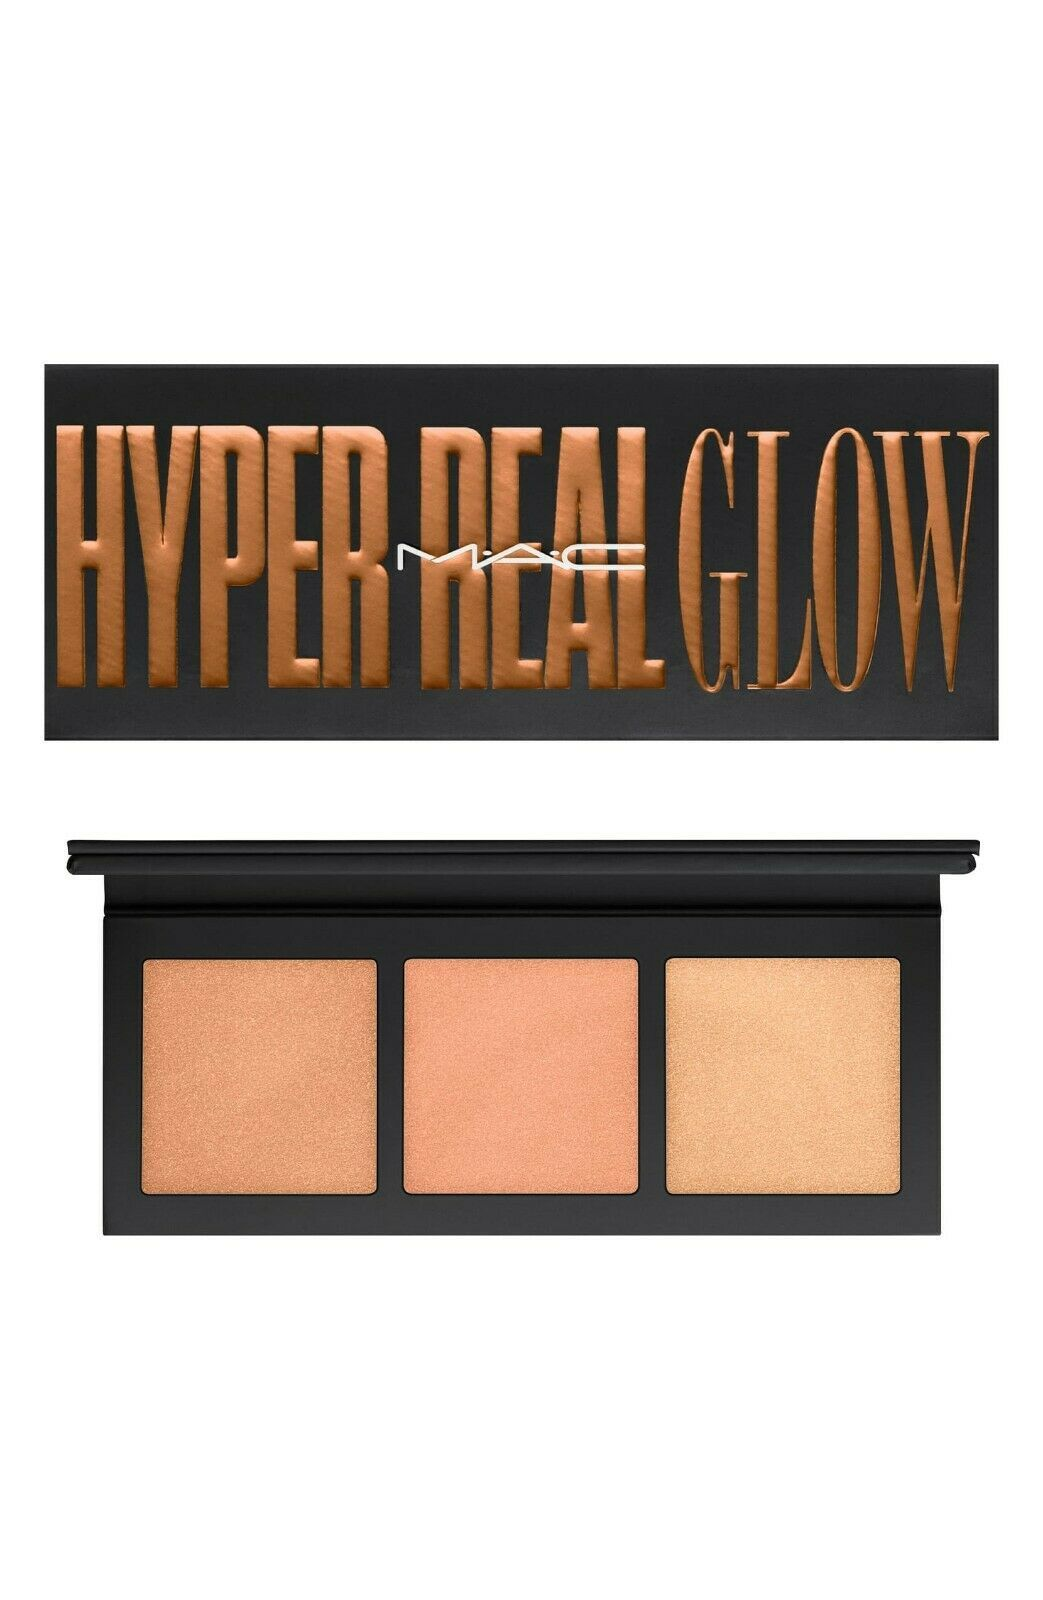 "MAC Hyper Real Glow Palette Get It Glowin' Large 6"" X 2 1/2"" size NIB Great Item - $16.81"